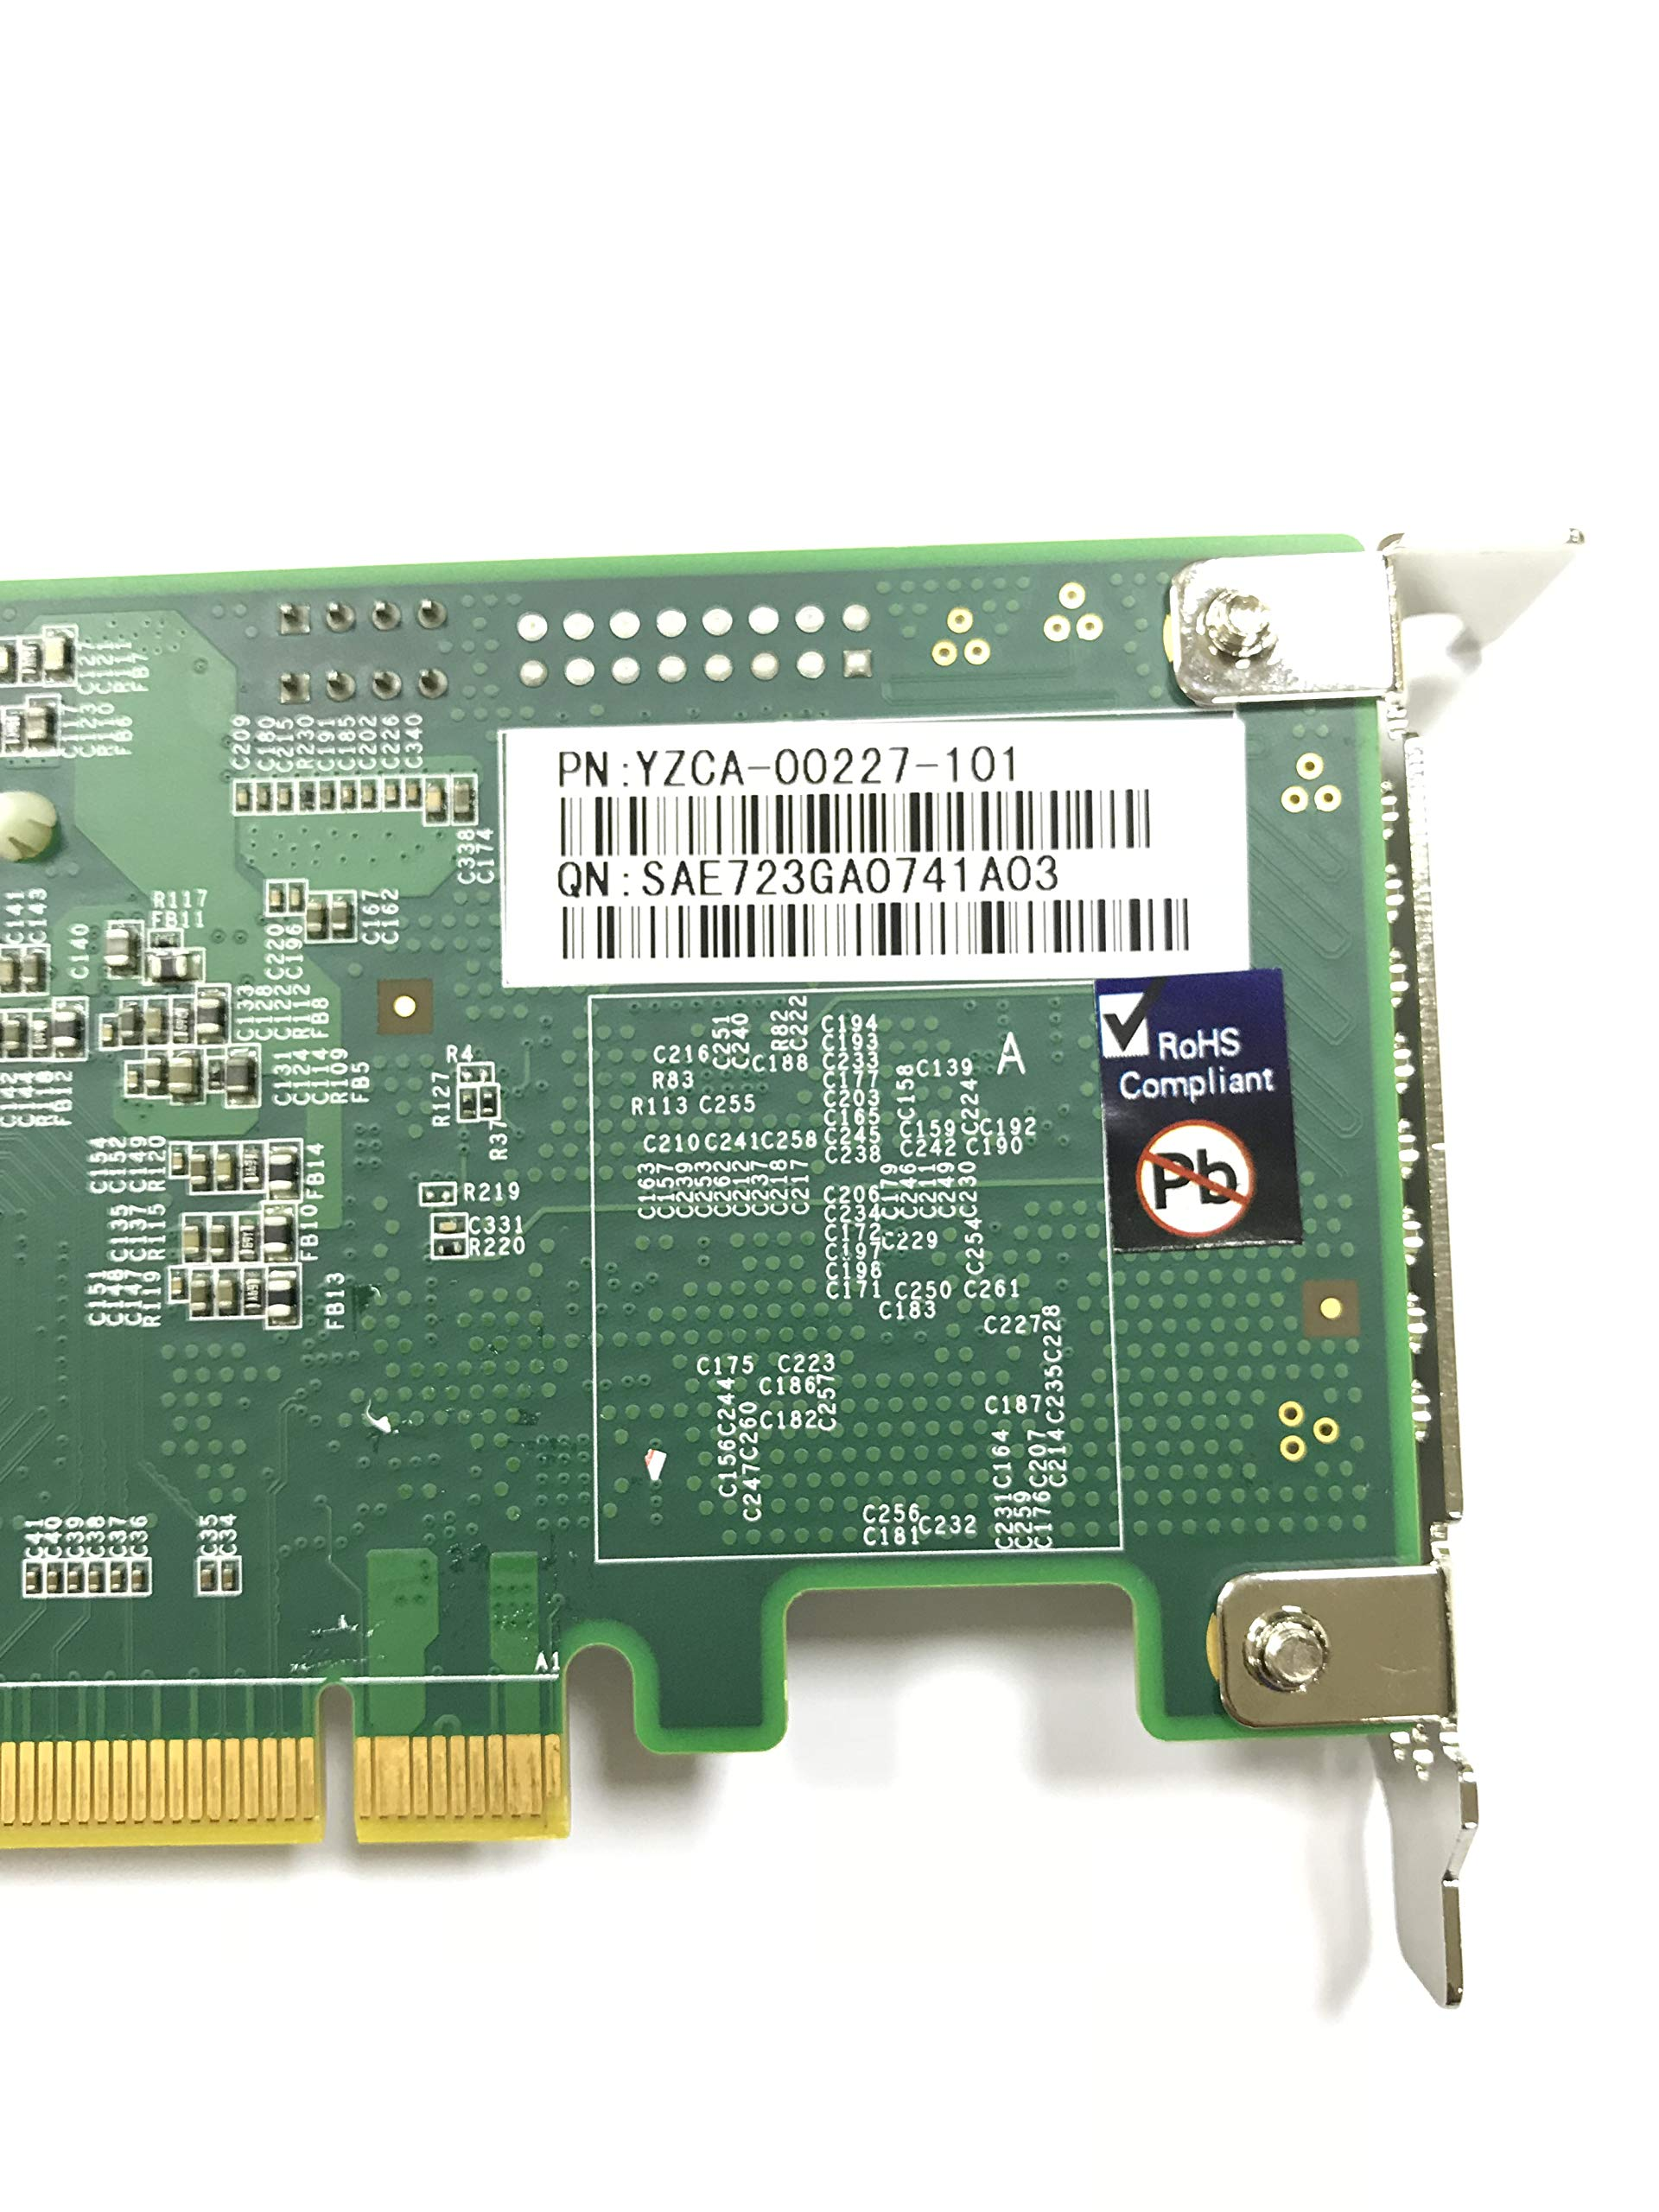 MFU SAS 9207-8i 8-Port 6Gb/s SAS+SATA to PCI Express 2.0 Host Bus Adapter by MFU (Image #3)